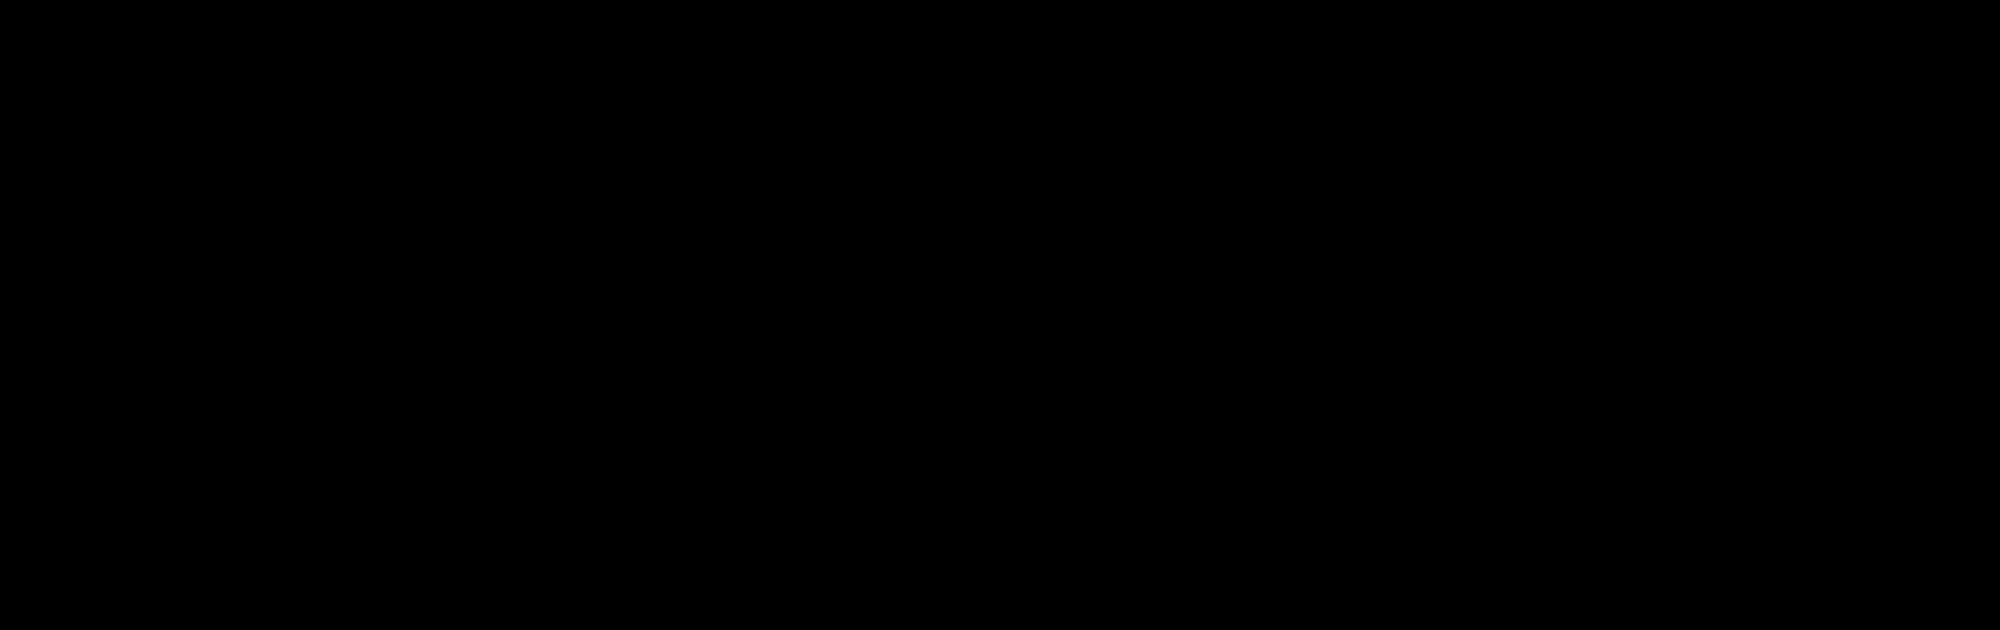 Grazia - Vinada